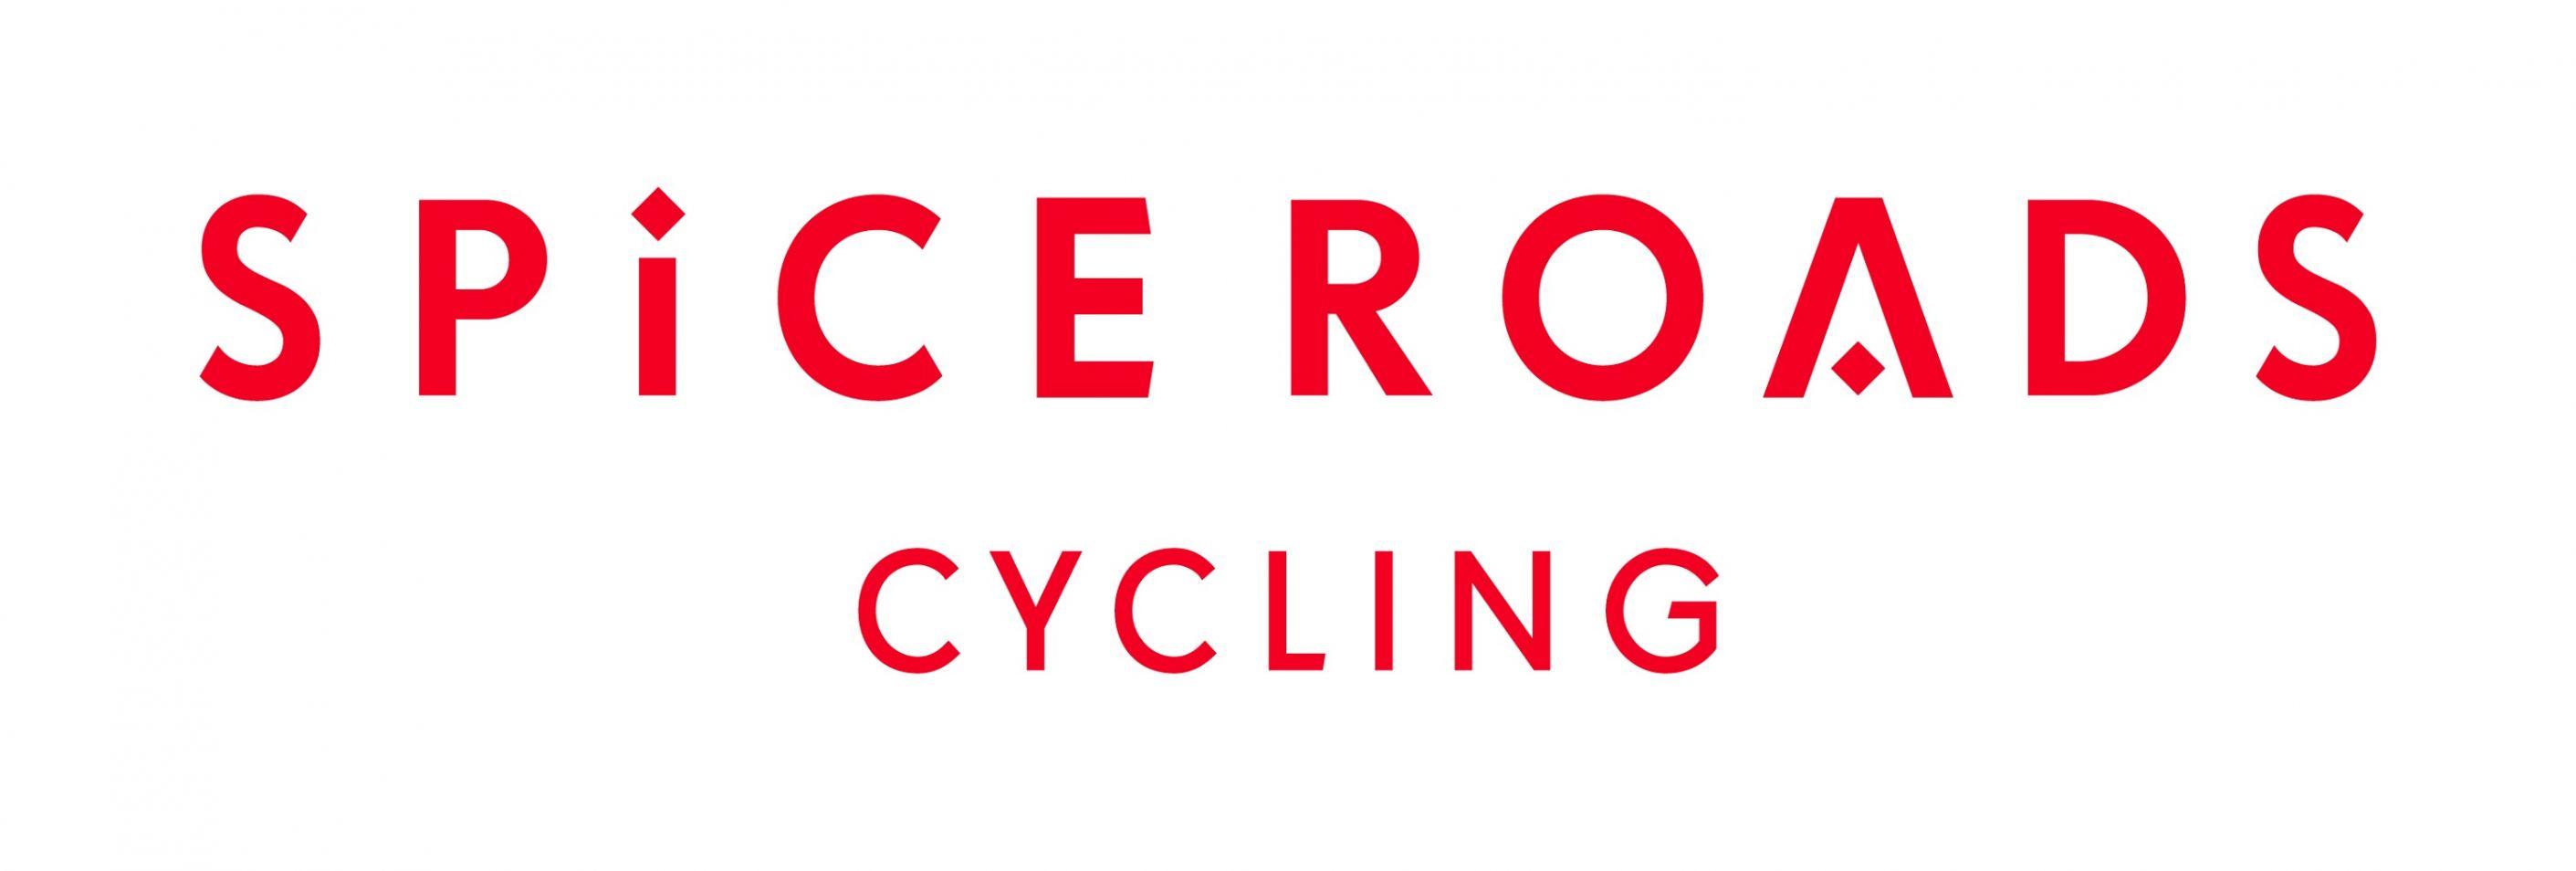 SpiceRoads Cycling Logo